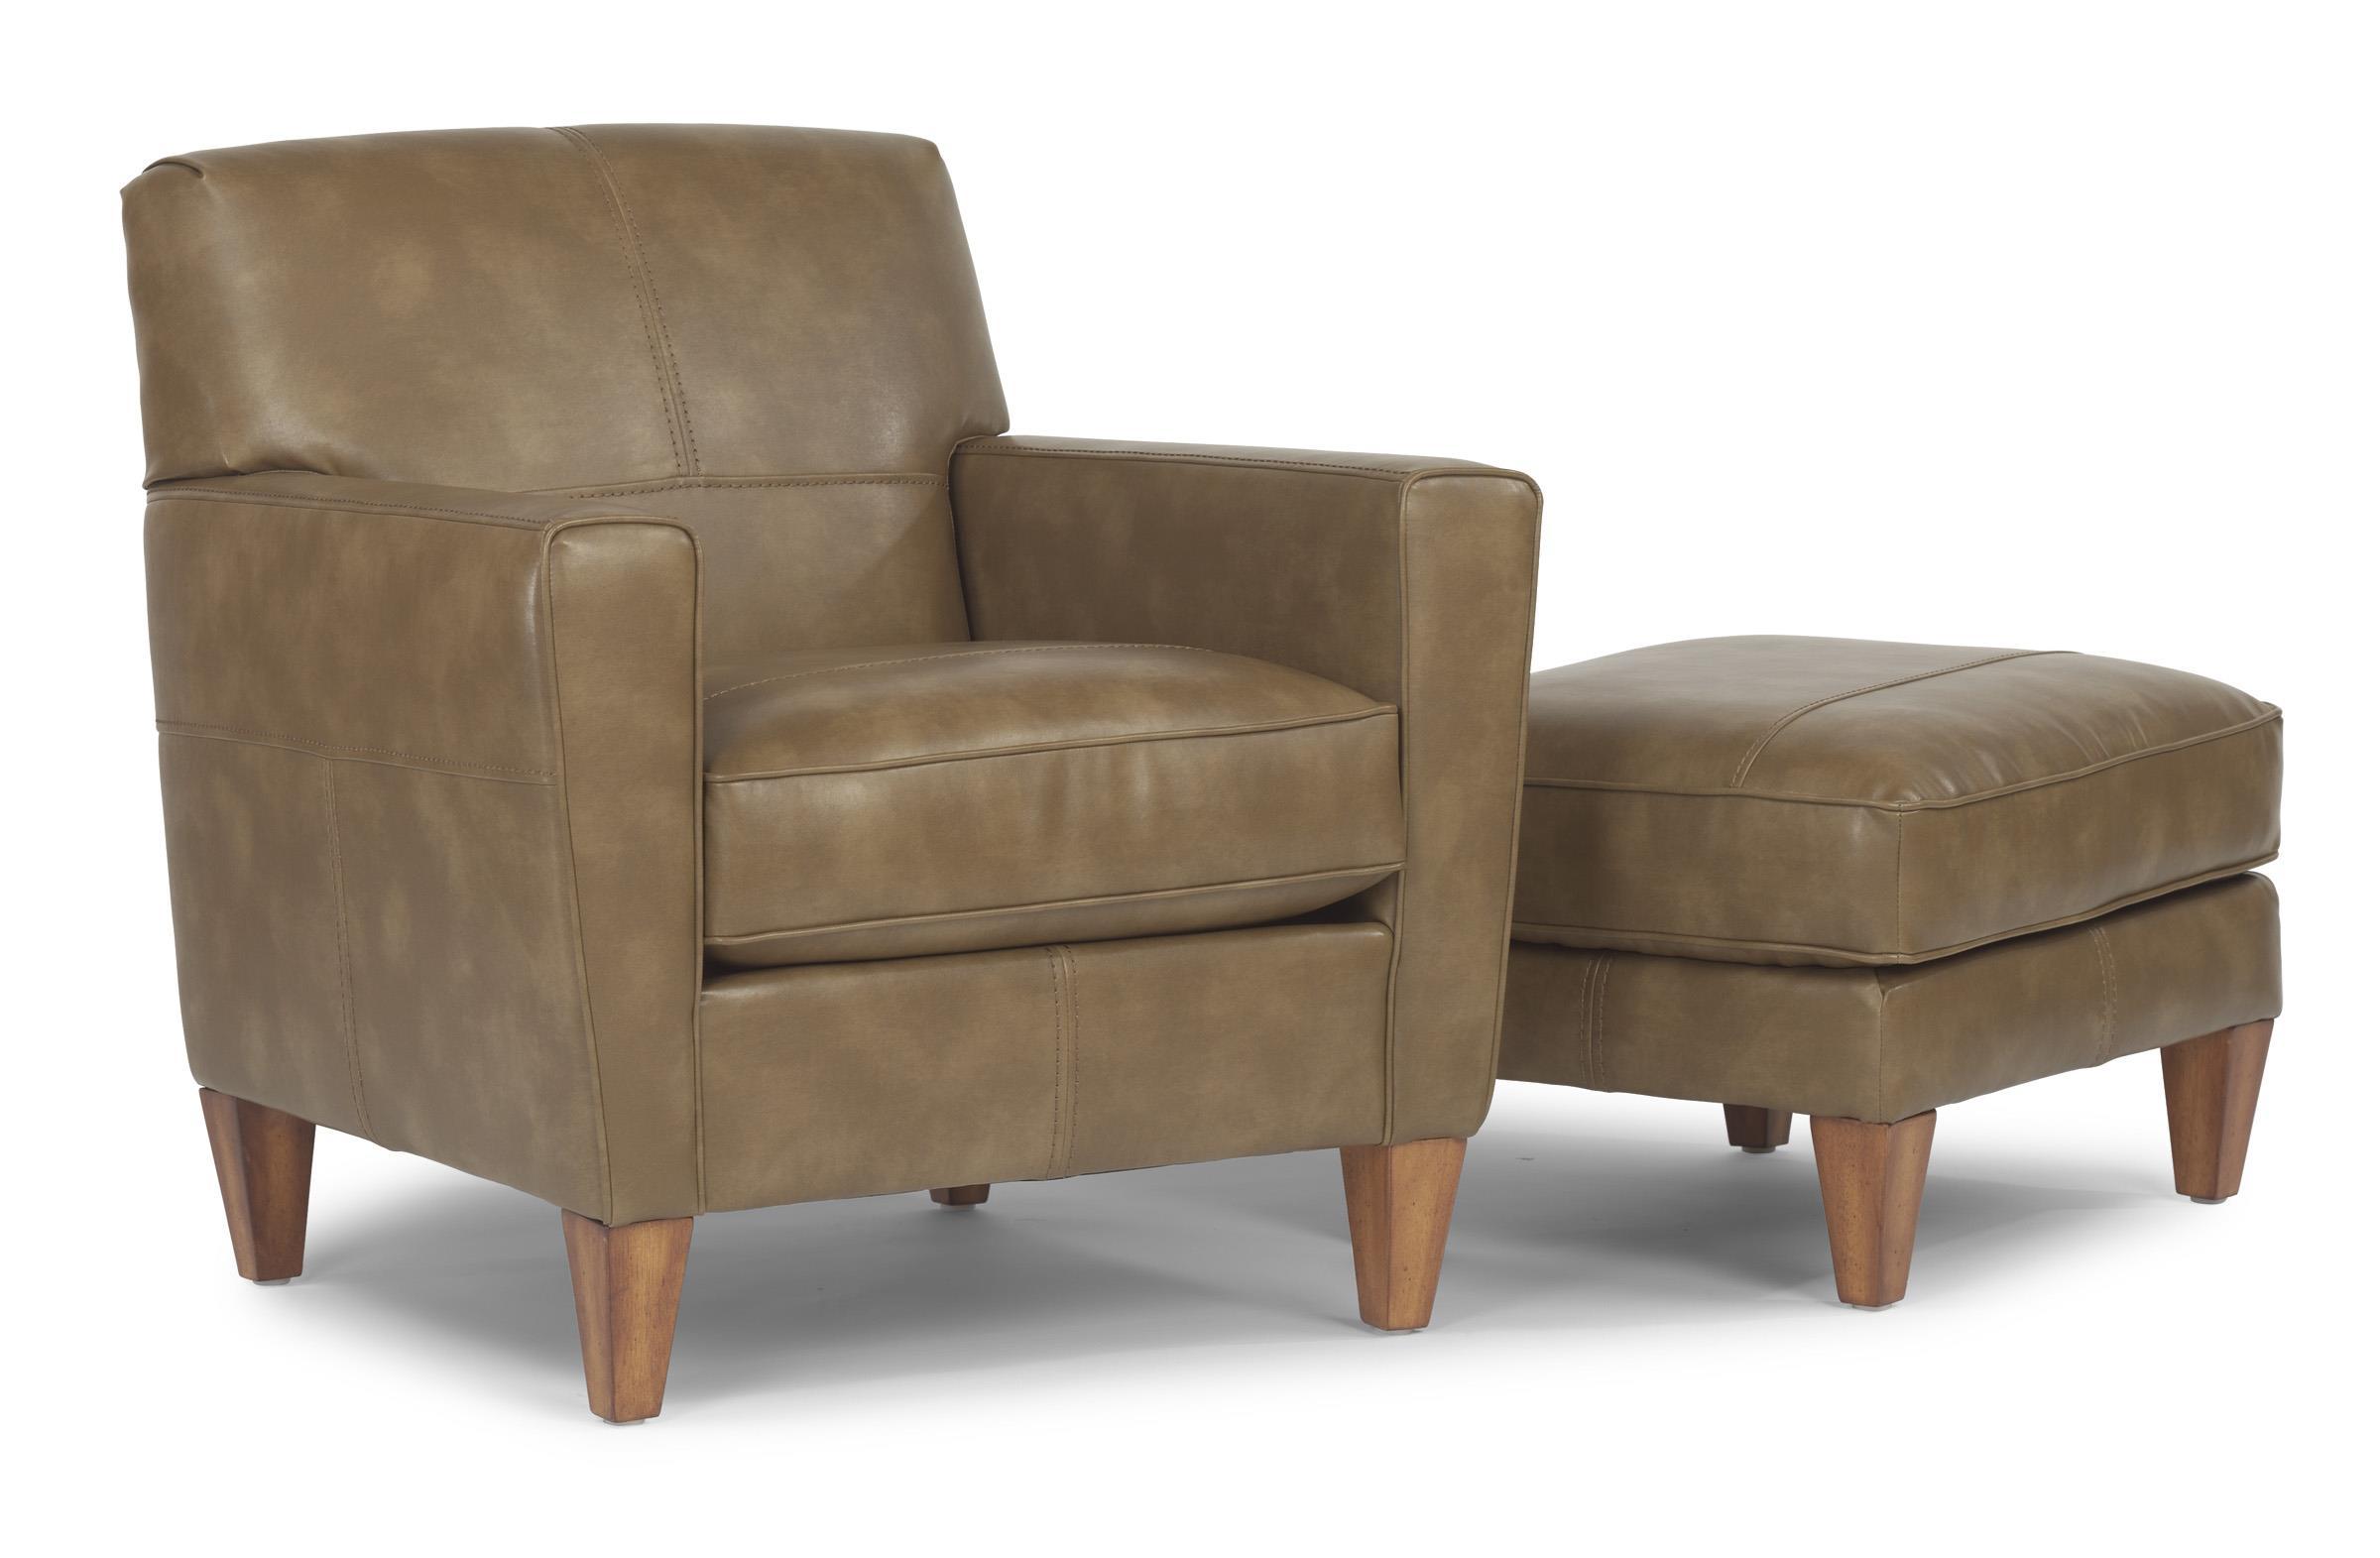 Flexsteel Digby N5966 10 Upholstered Chair John V Schultz Furniture Upholstered Chairs